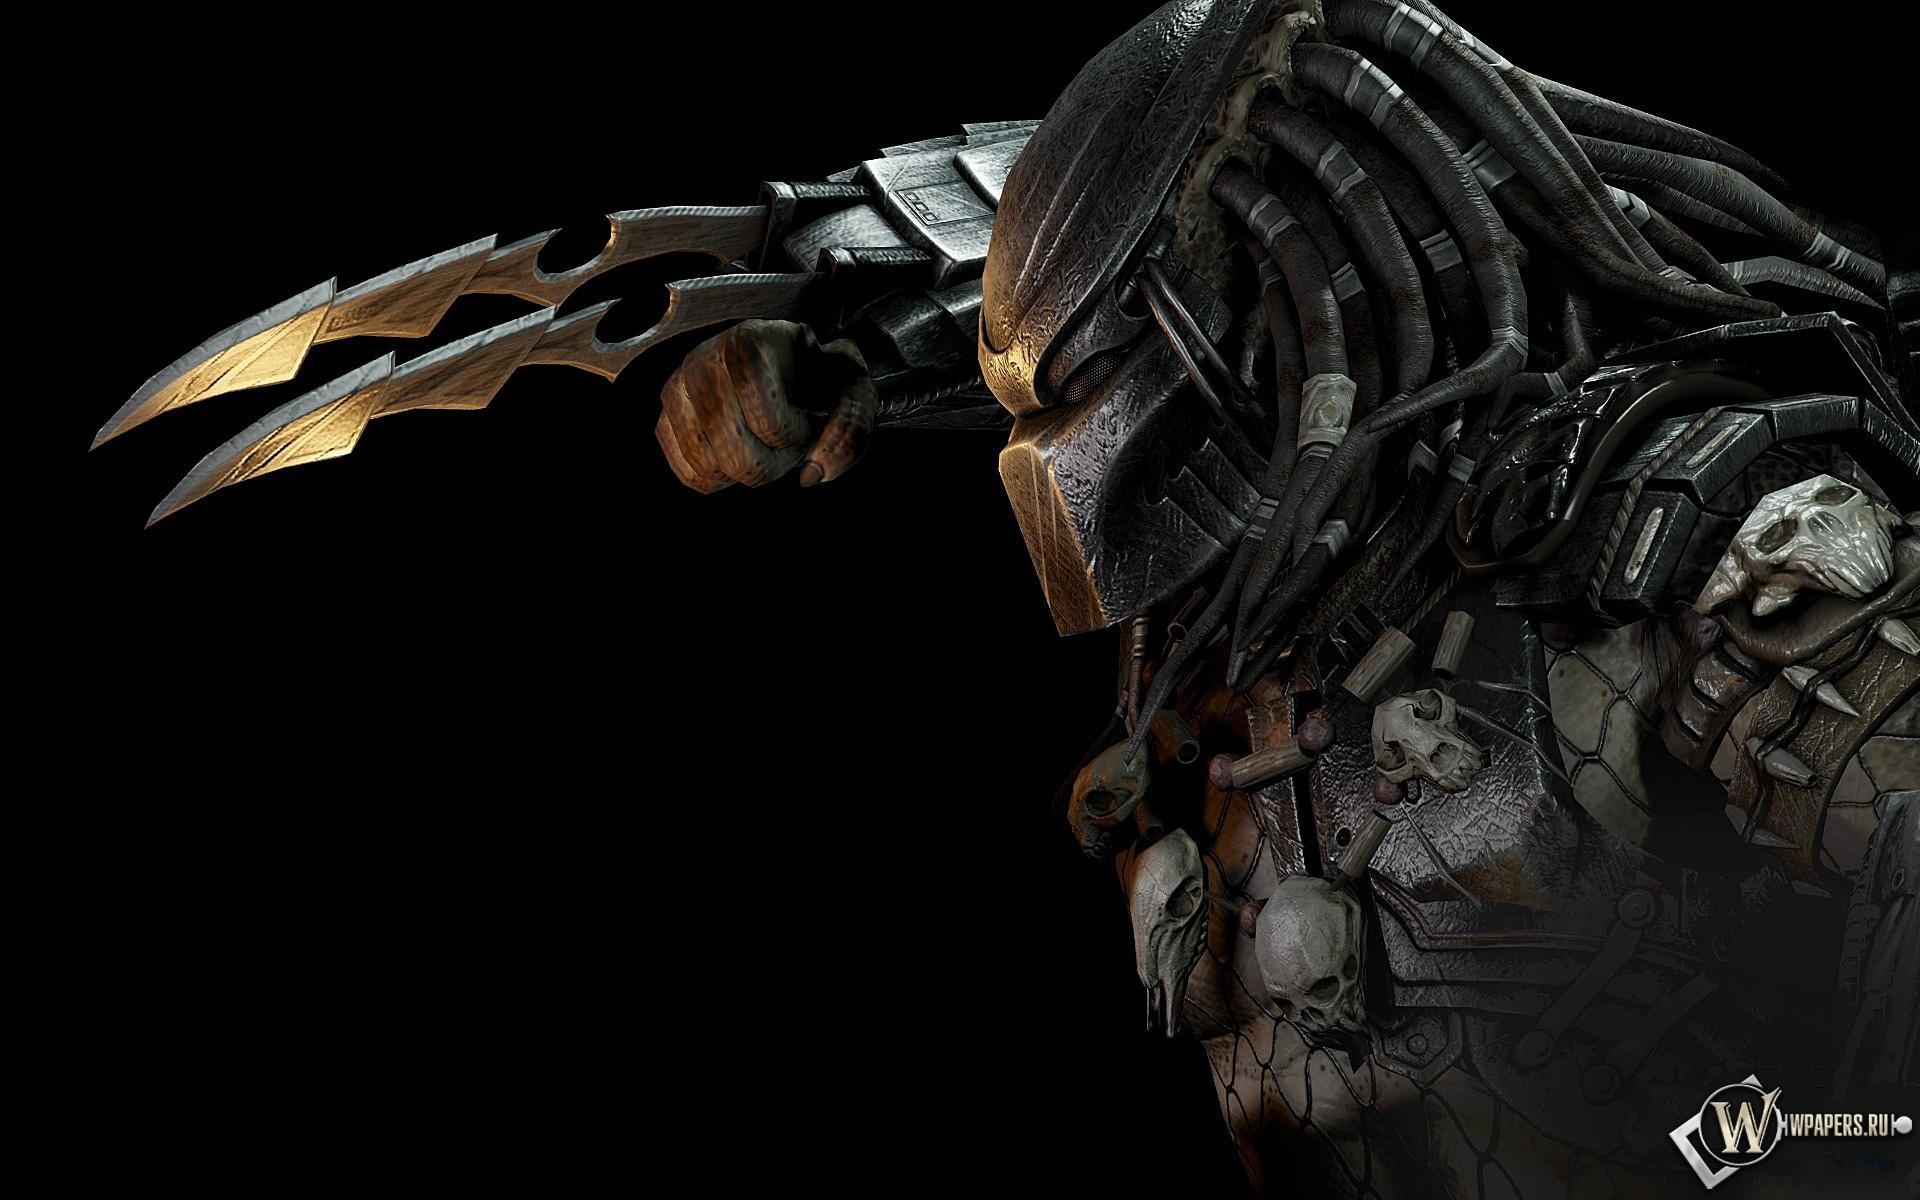 Fond dcran Predator gratuit fonds cran Predator aliens 1920x1200